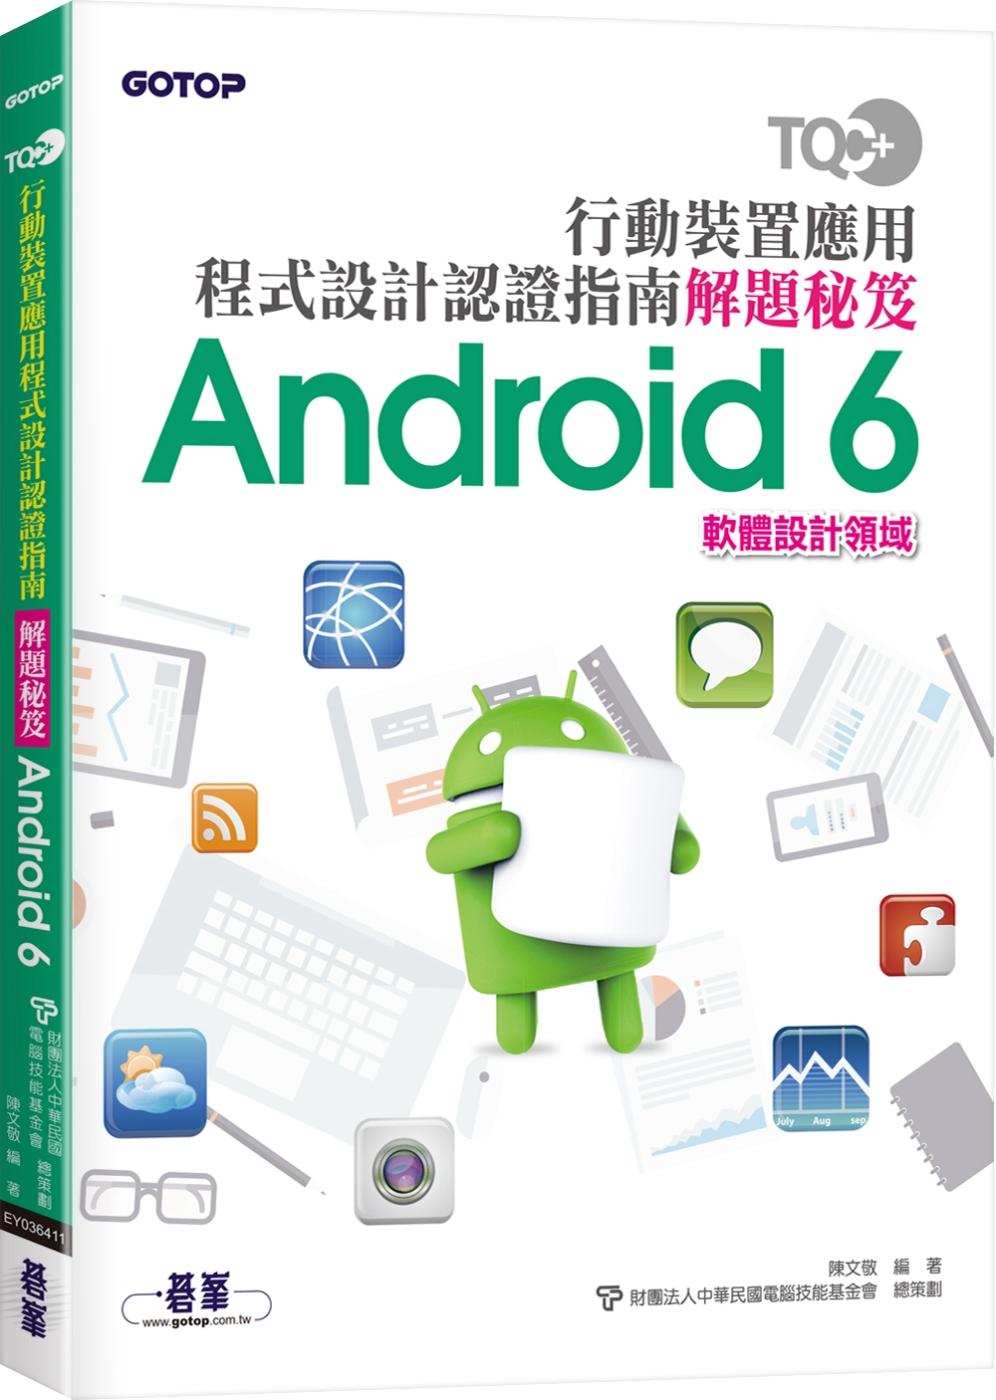 TQC+ 行動裝置應用程式設計認證指南解題秘笈:Android 6